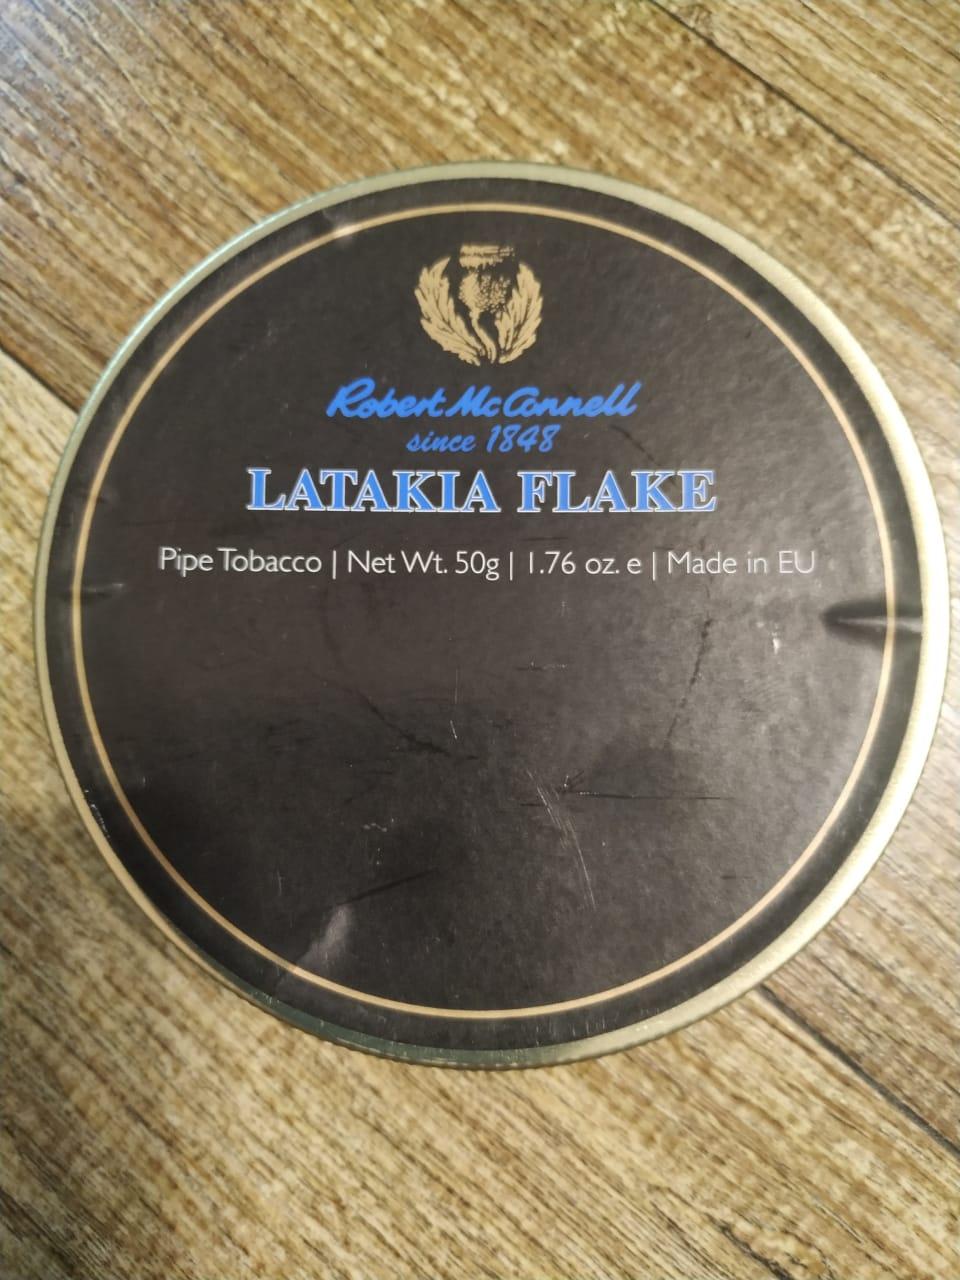 Robert McConnell - Latakia Flake